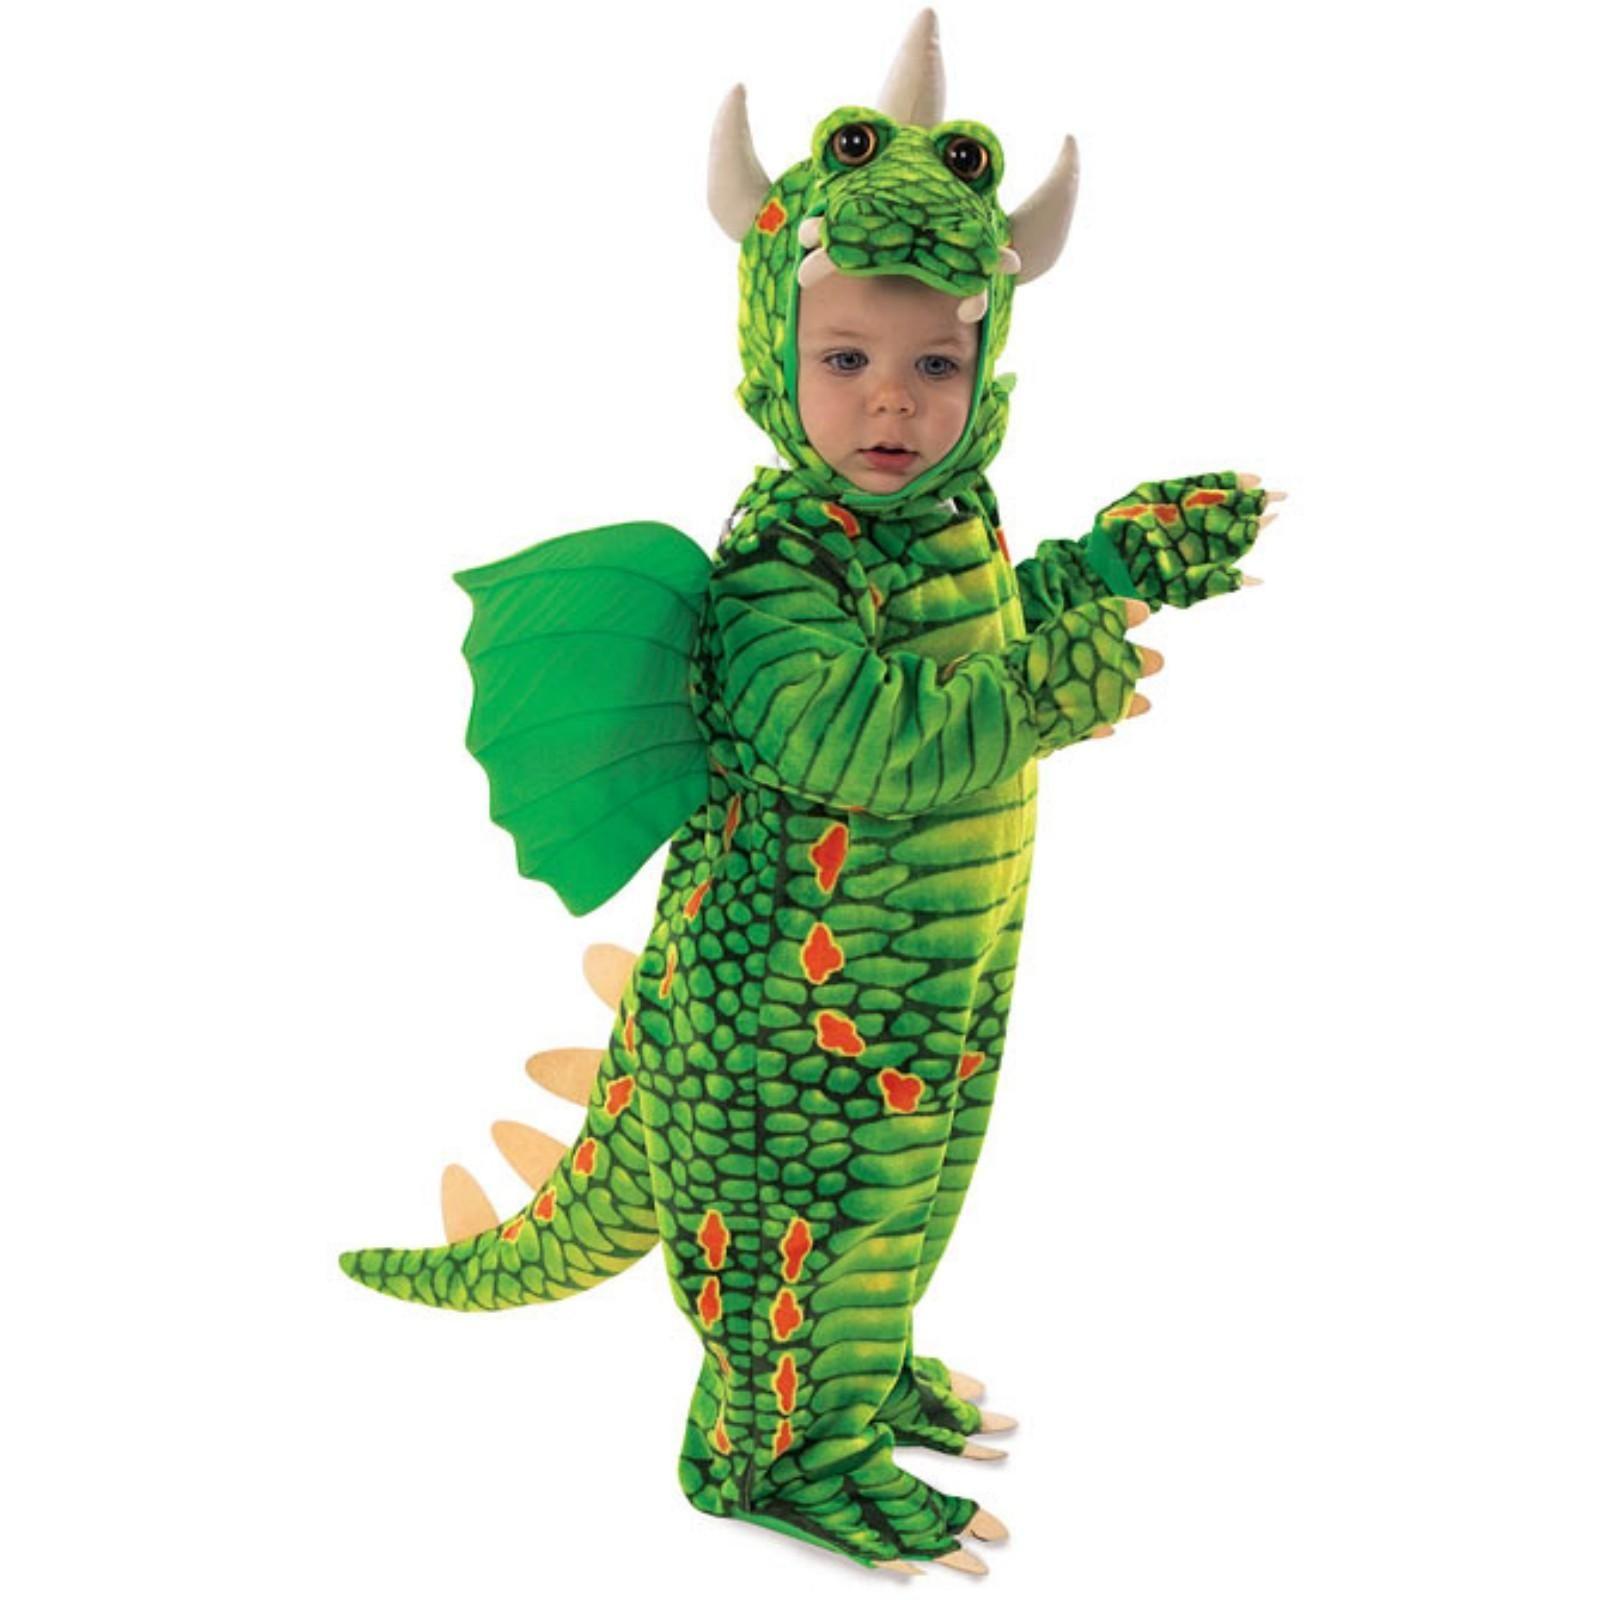 Teagan the Dragon Costume